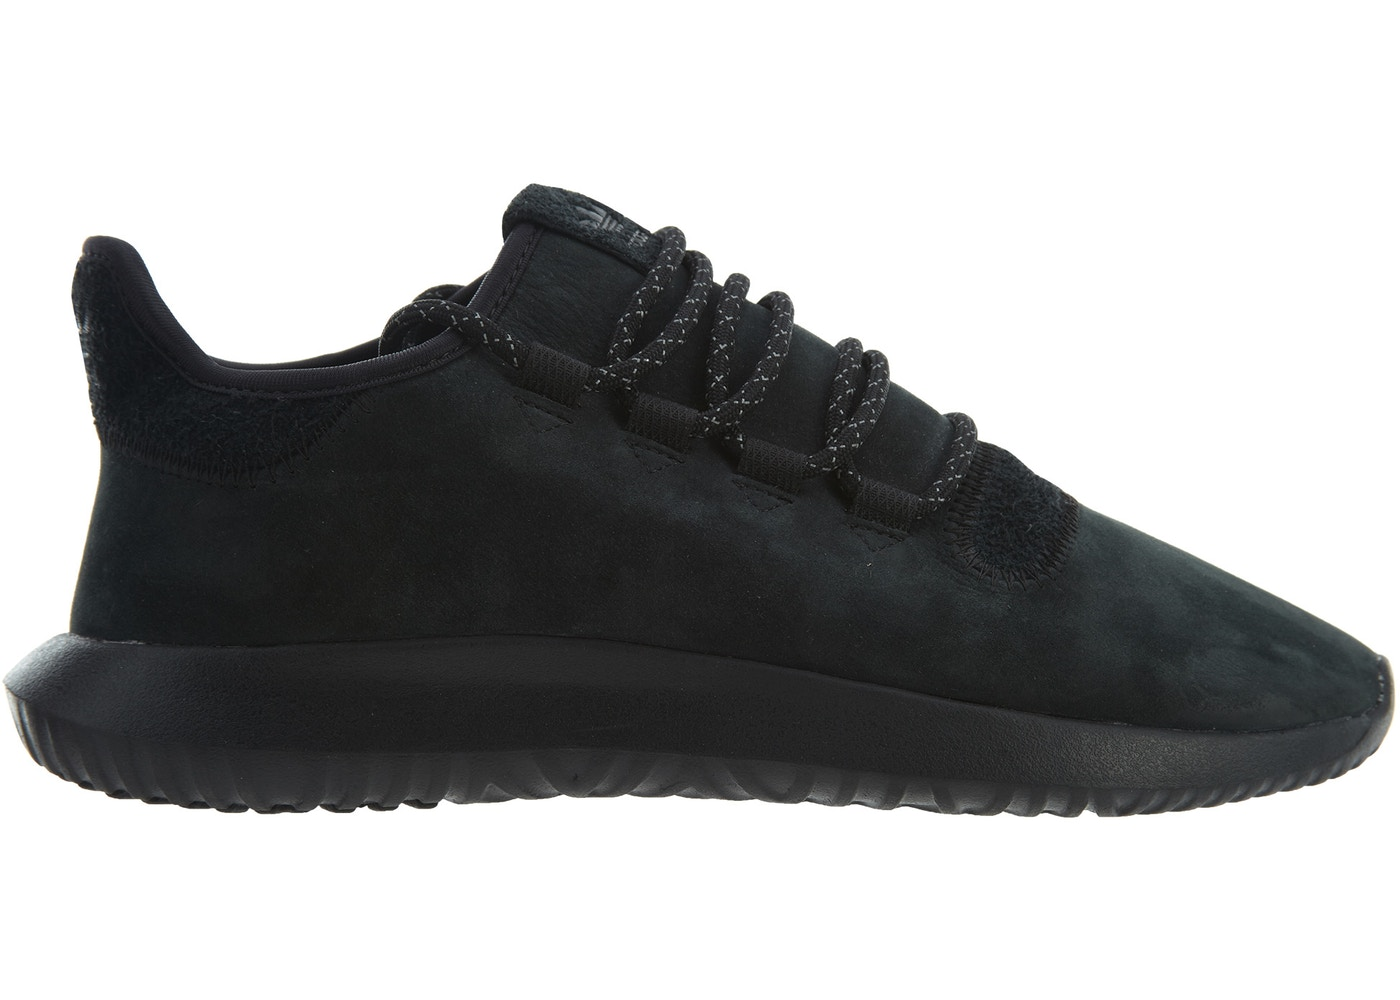 on sale 8bde3 dae47 adidas Tubular Shadow Black Black-White